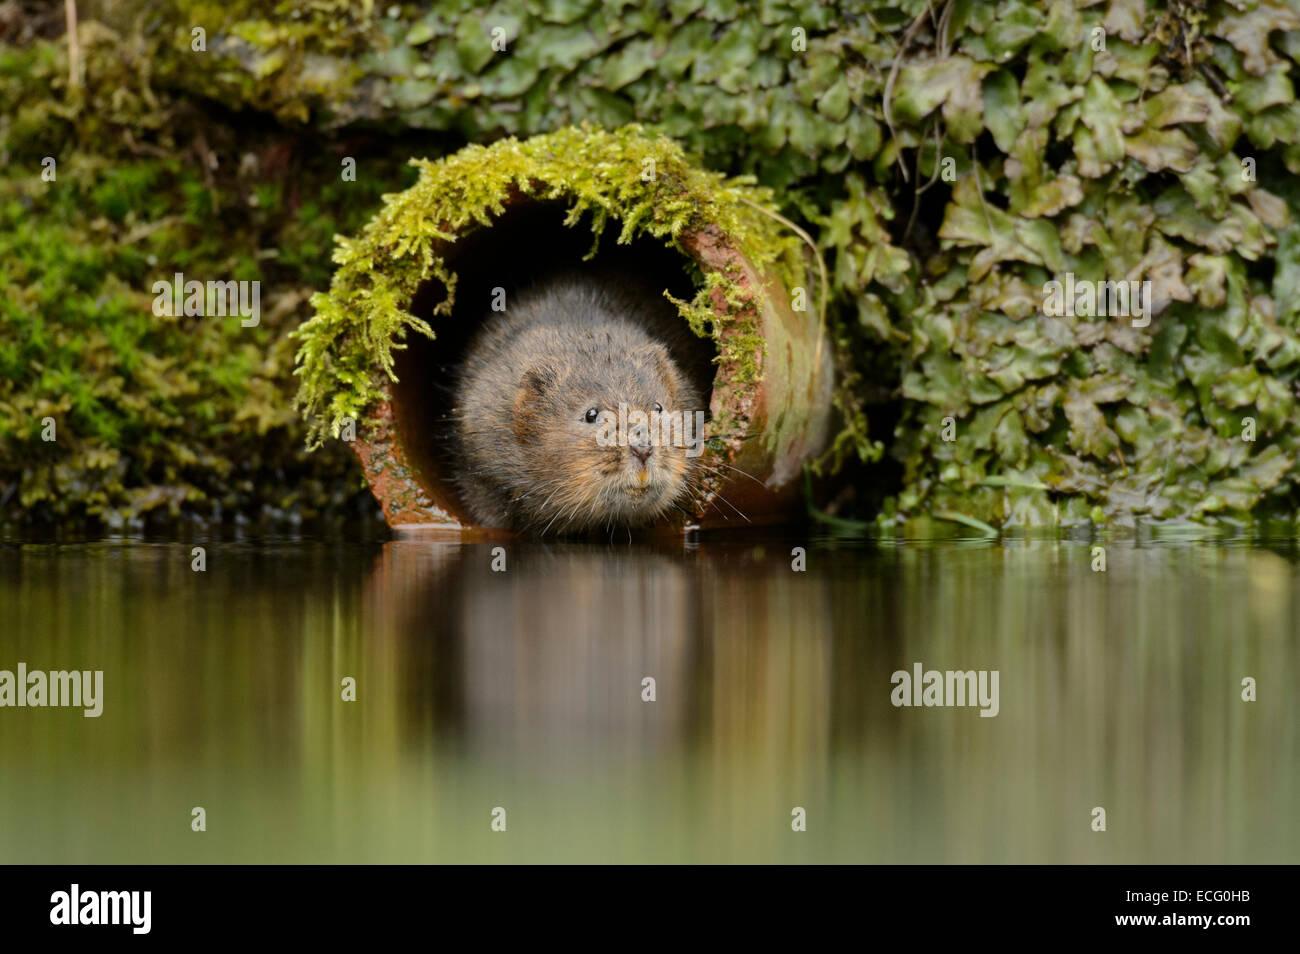 Water vole (Arvicola amphibius) in drainage pipe, Kent, England, UK. - Stock Image